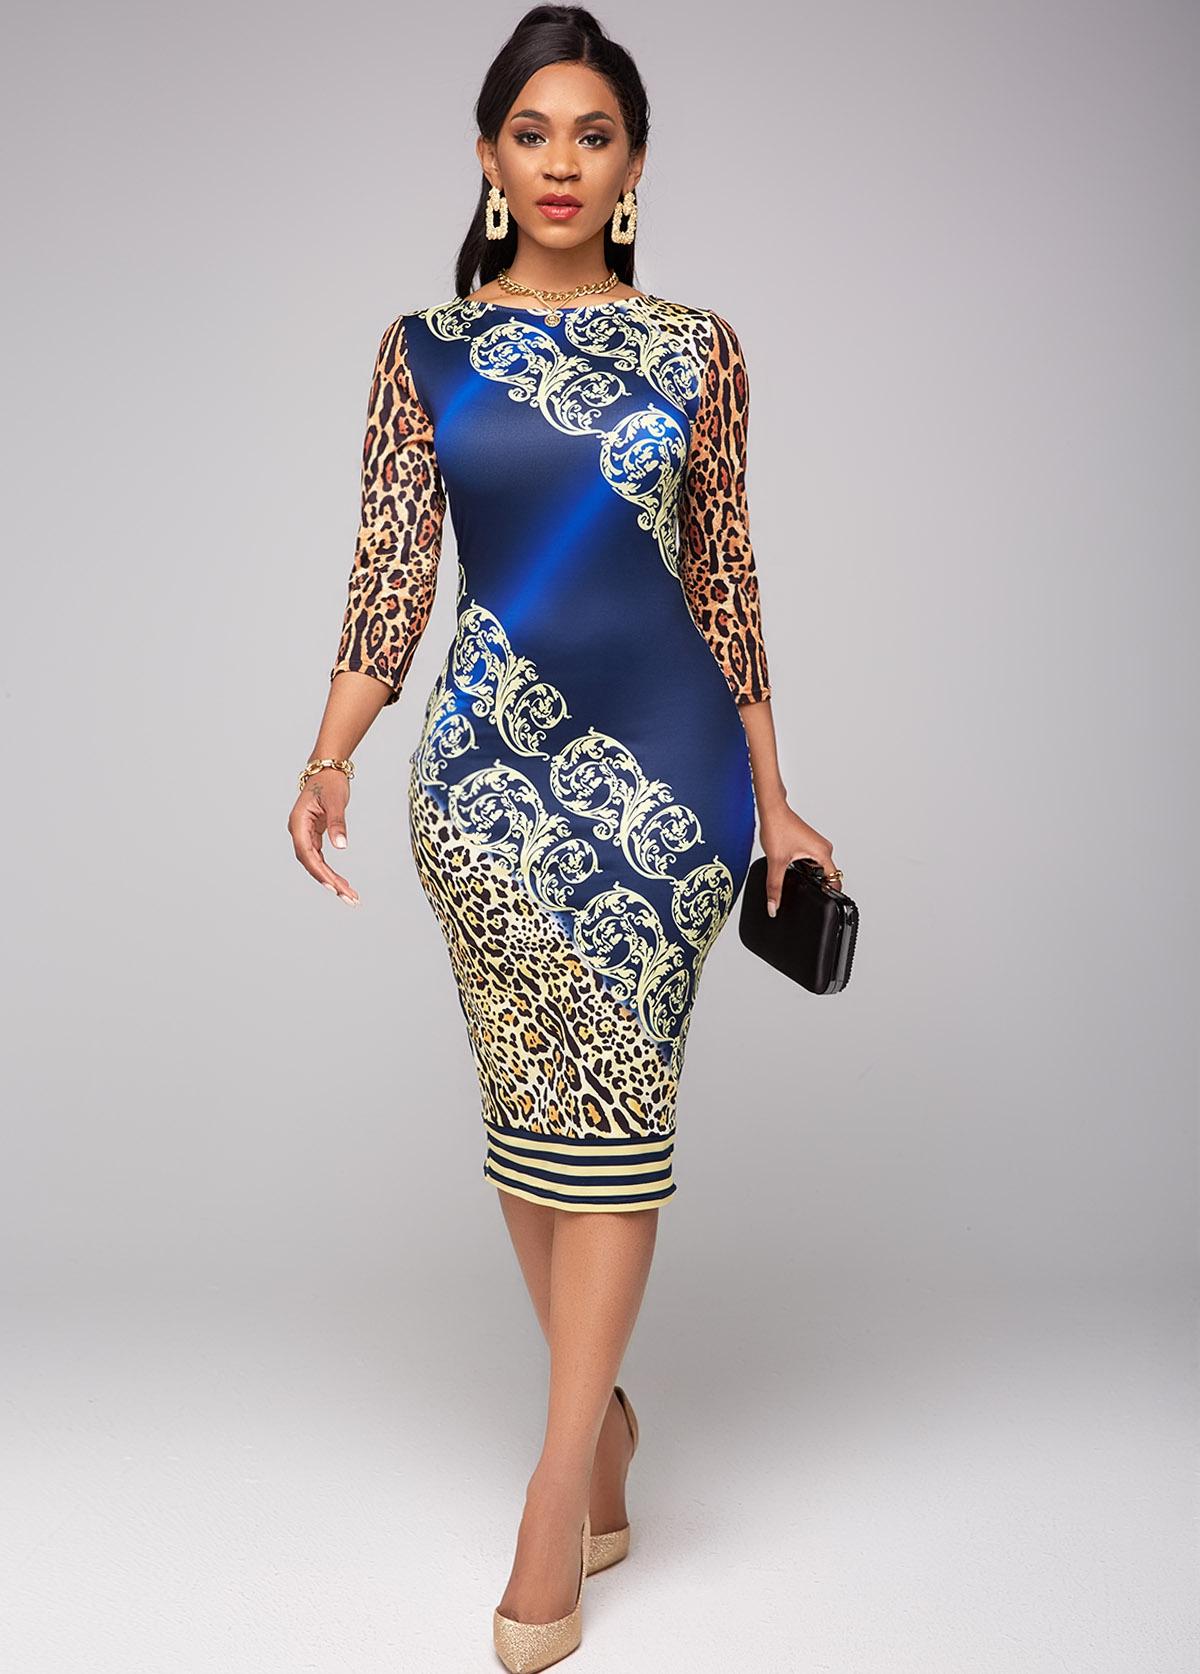 ROTITA Round Neck Leopard 3/4 Sleeve Dress